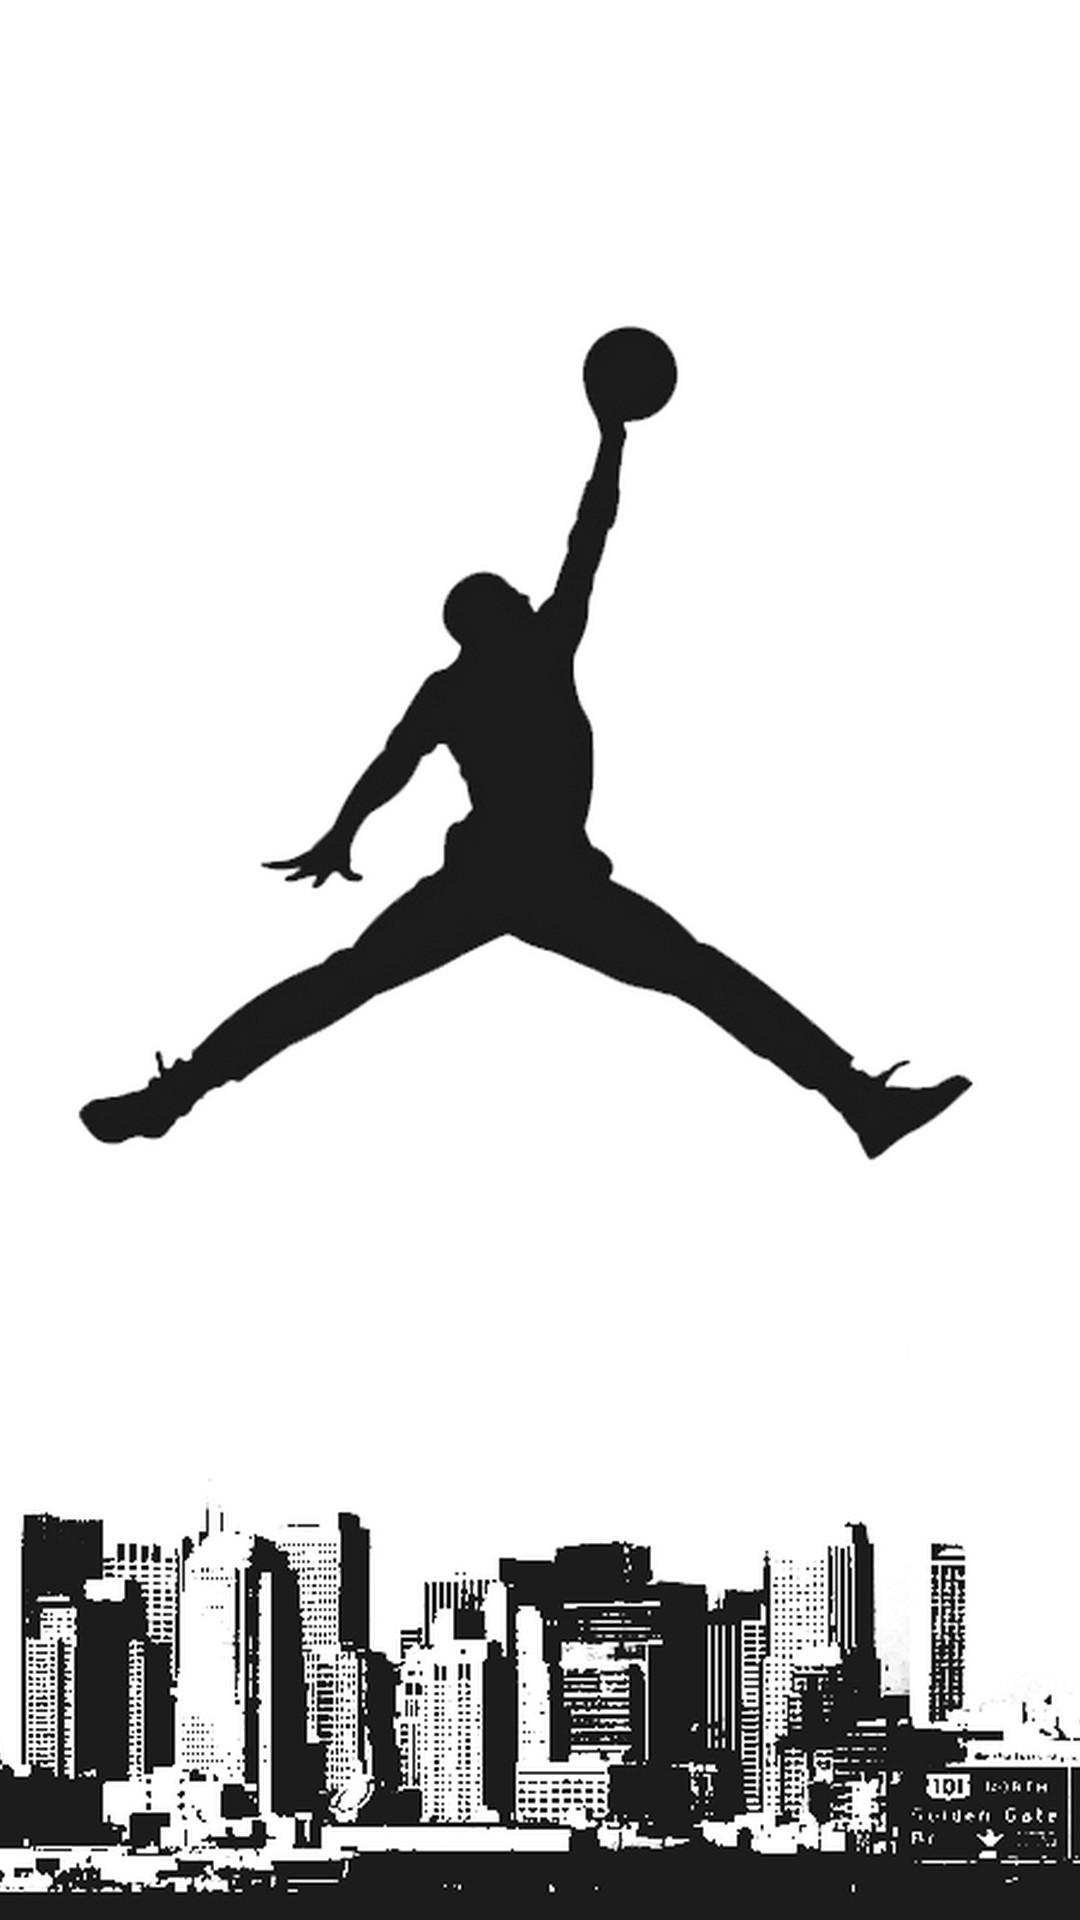 Wallpaper NBA Basketball Mobile 2020 Basketball Wallpaper 1080x1920